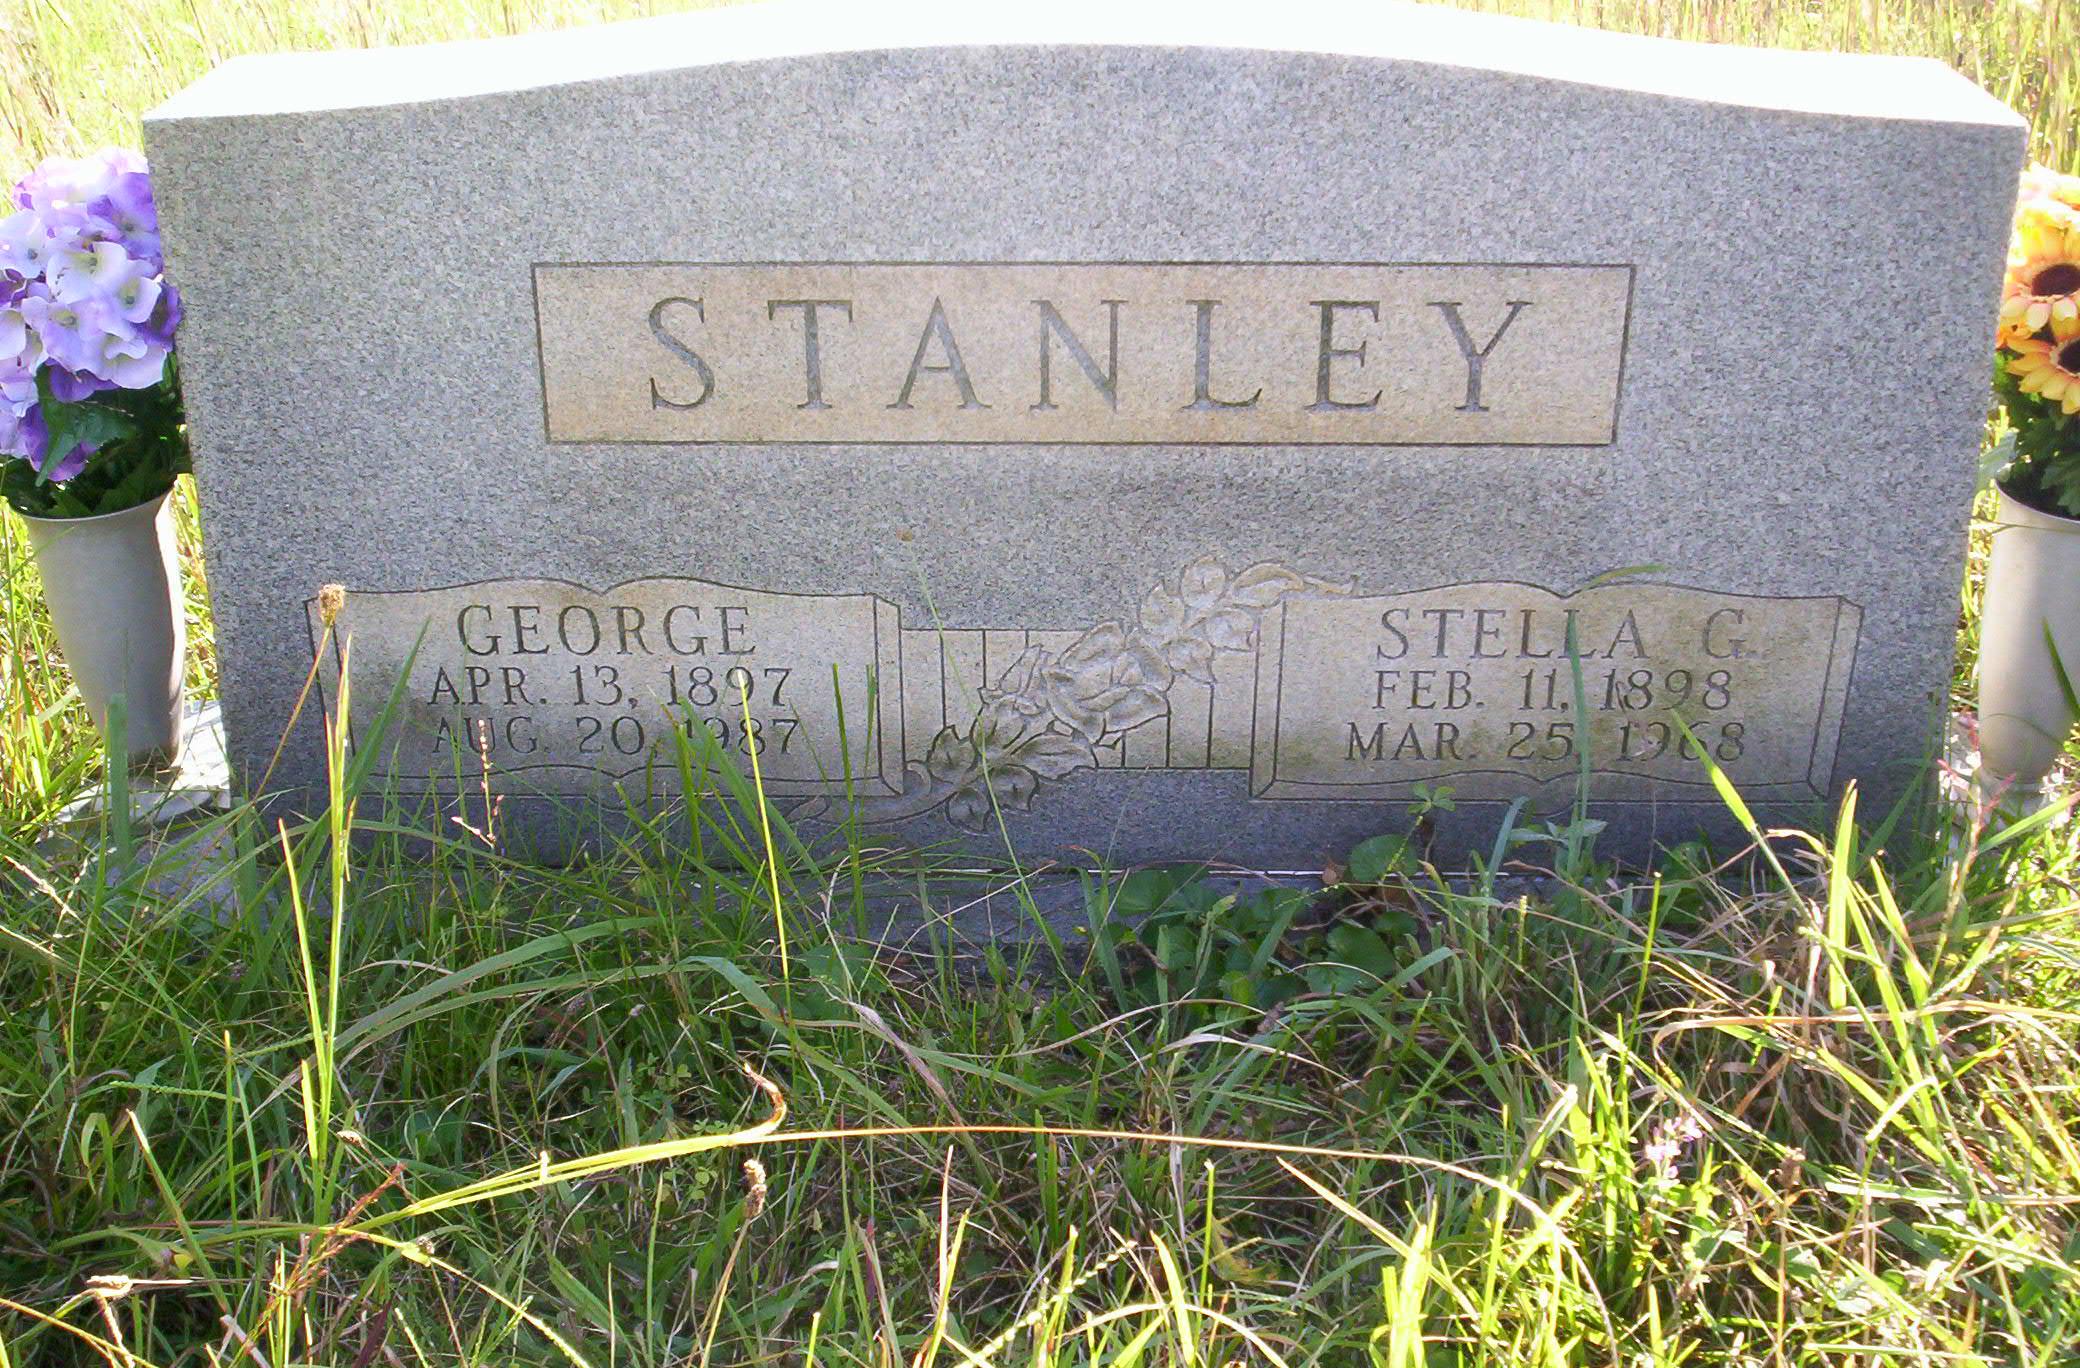 George Washington Stanley